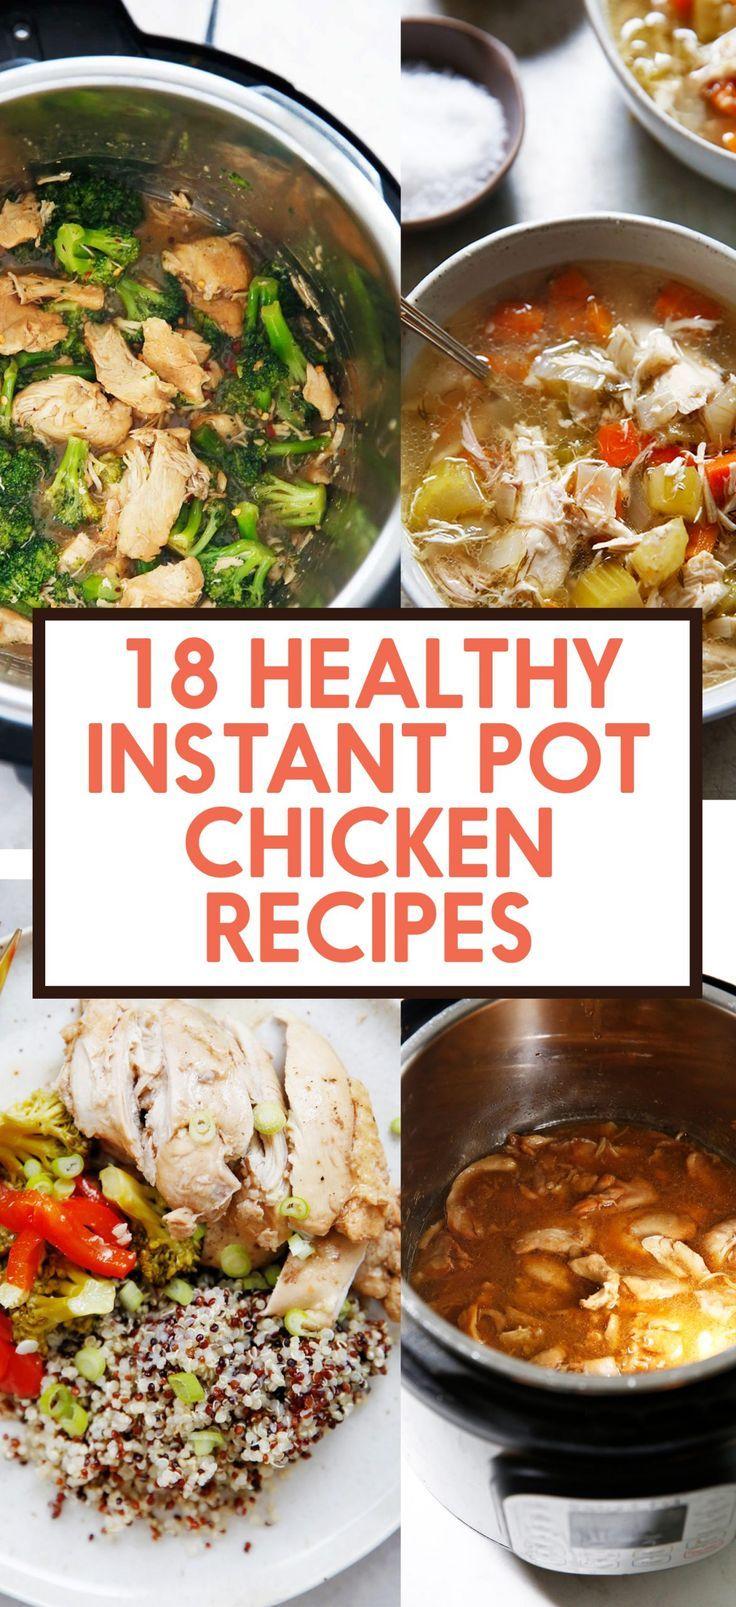 18 Healthy Instant Pot Chicken Recipes Lexi S Clean Kitchen Pot Recipes Healthy Healthy Instant Pot Recipes Chicken Recipes